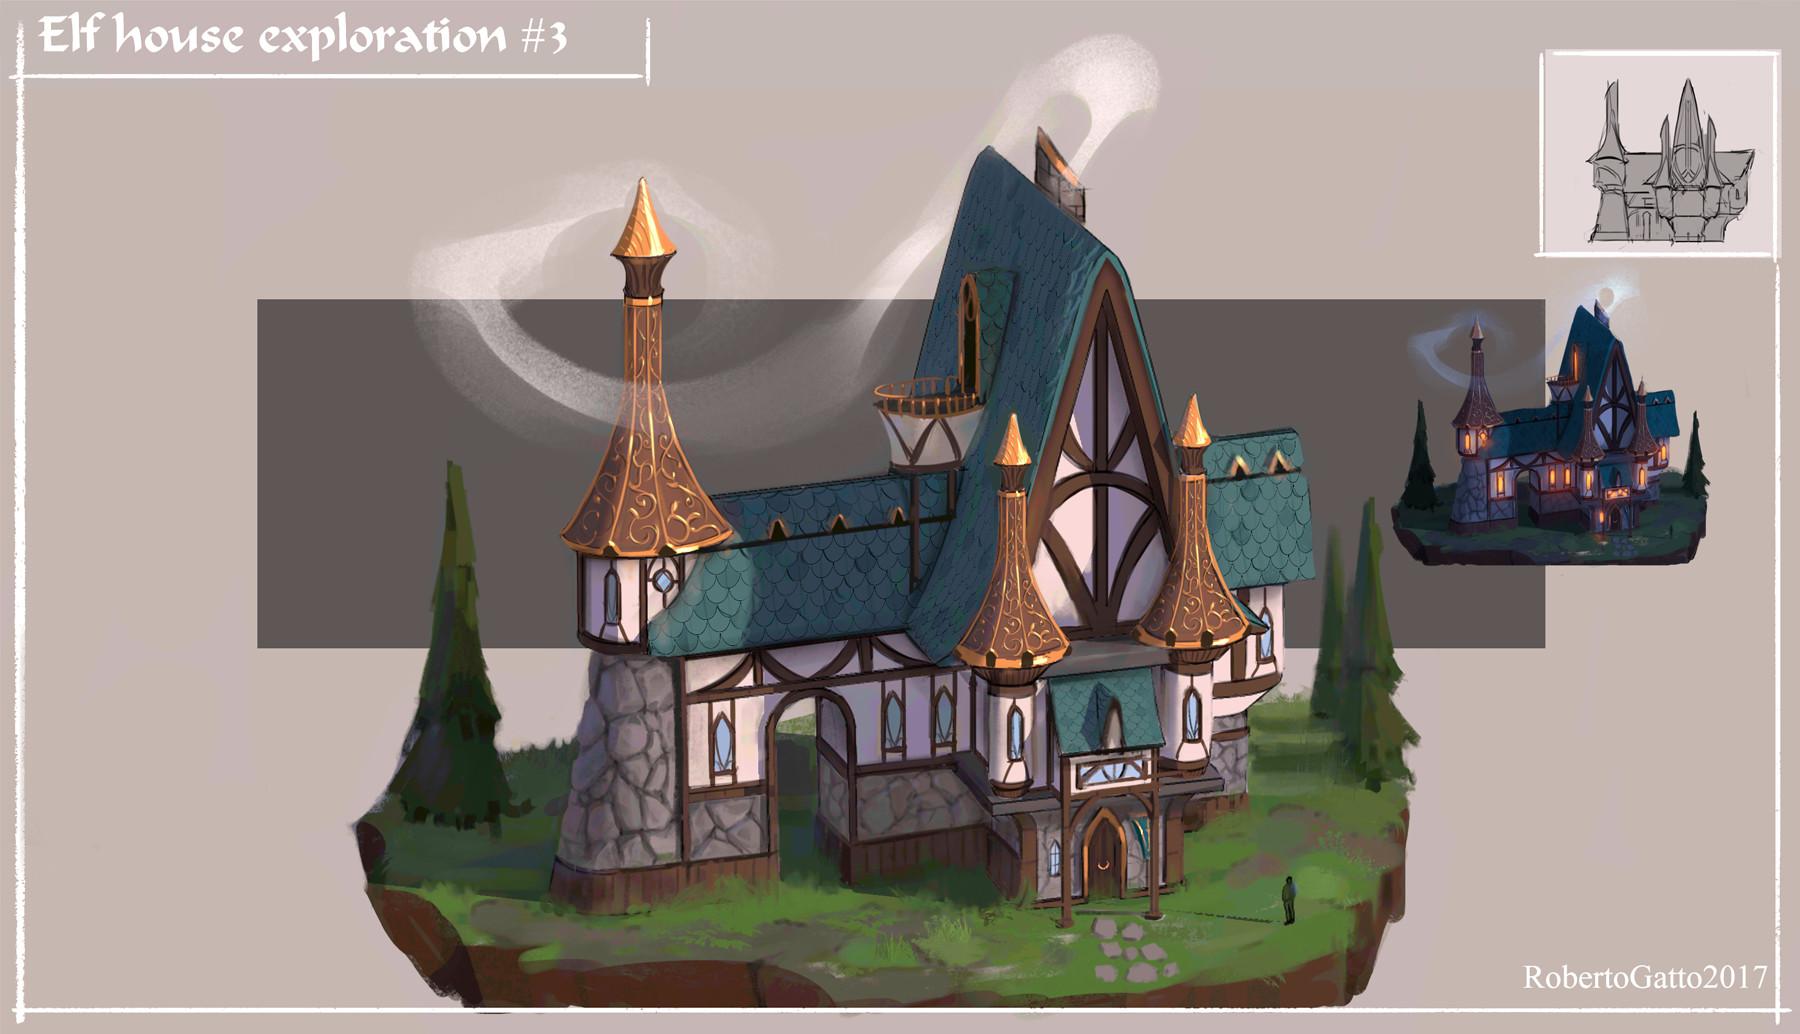 roberto-gatto-elf-house-exploration.jpg